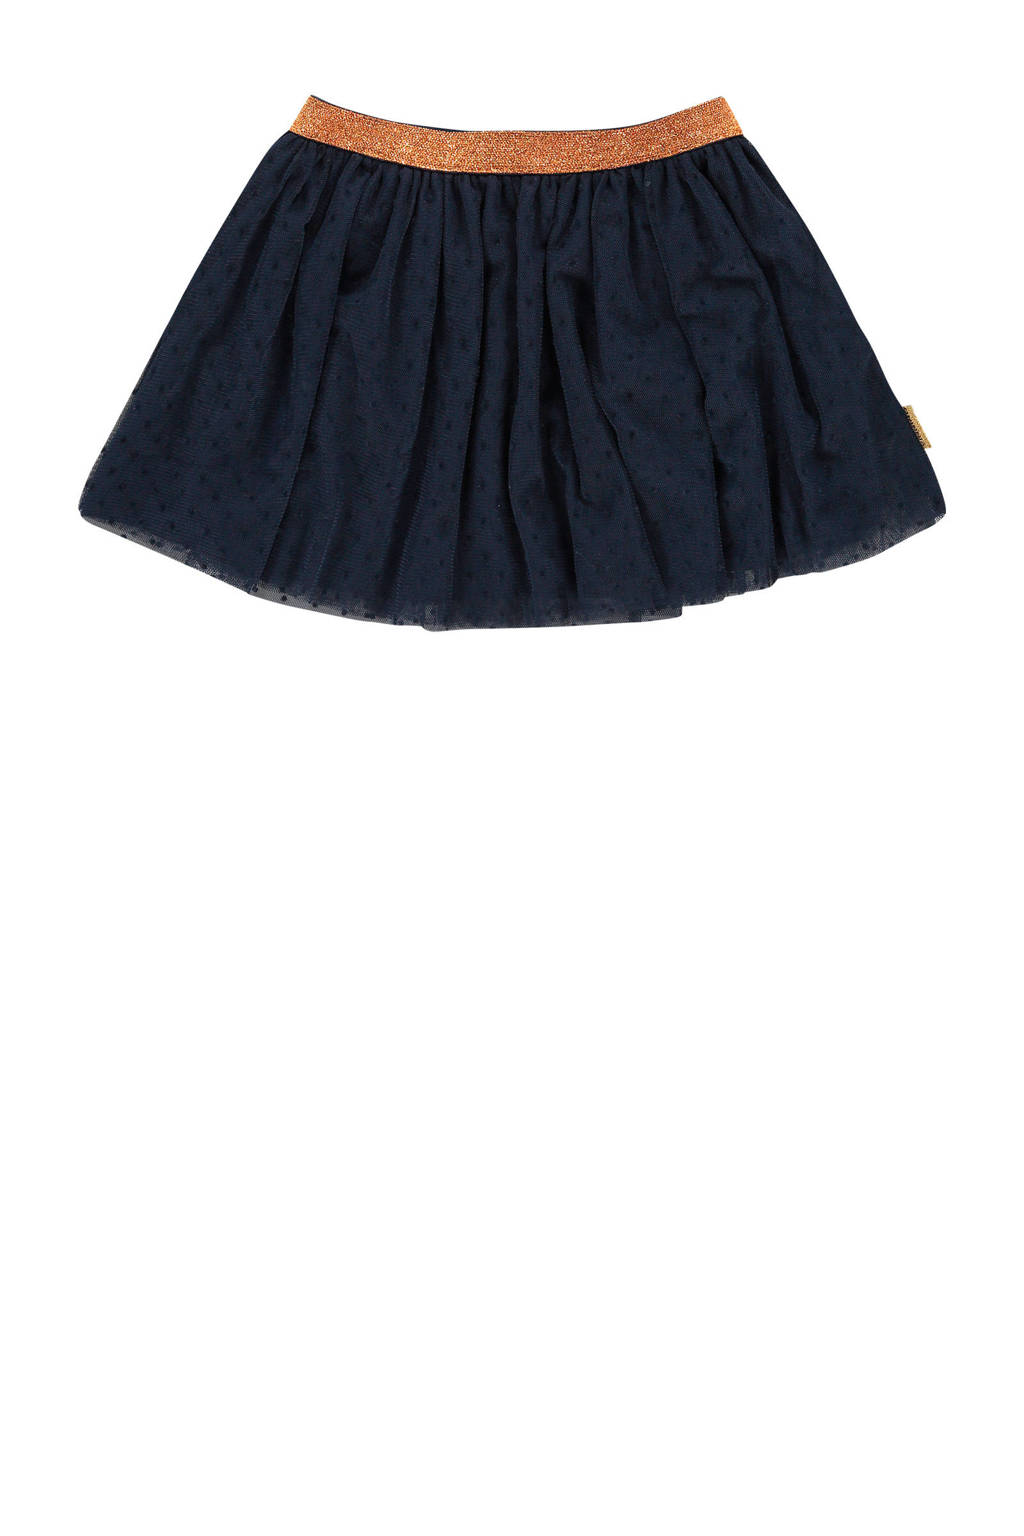 Vingino rok Qwen mini met glitters donkerblauw, Donkerblauw